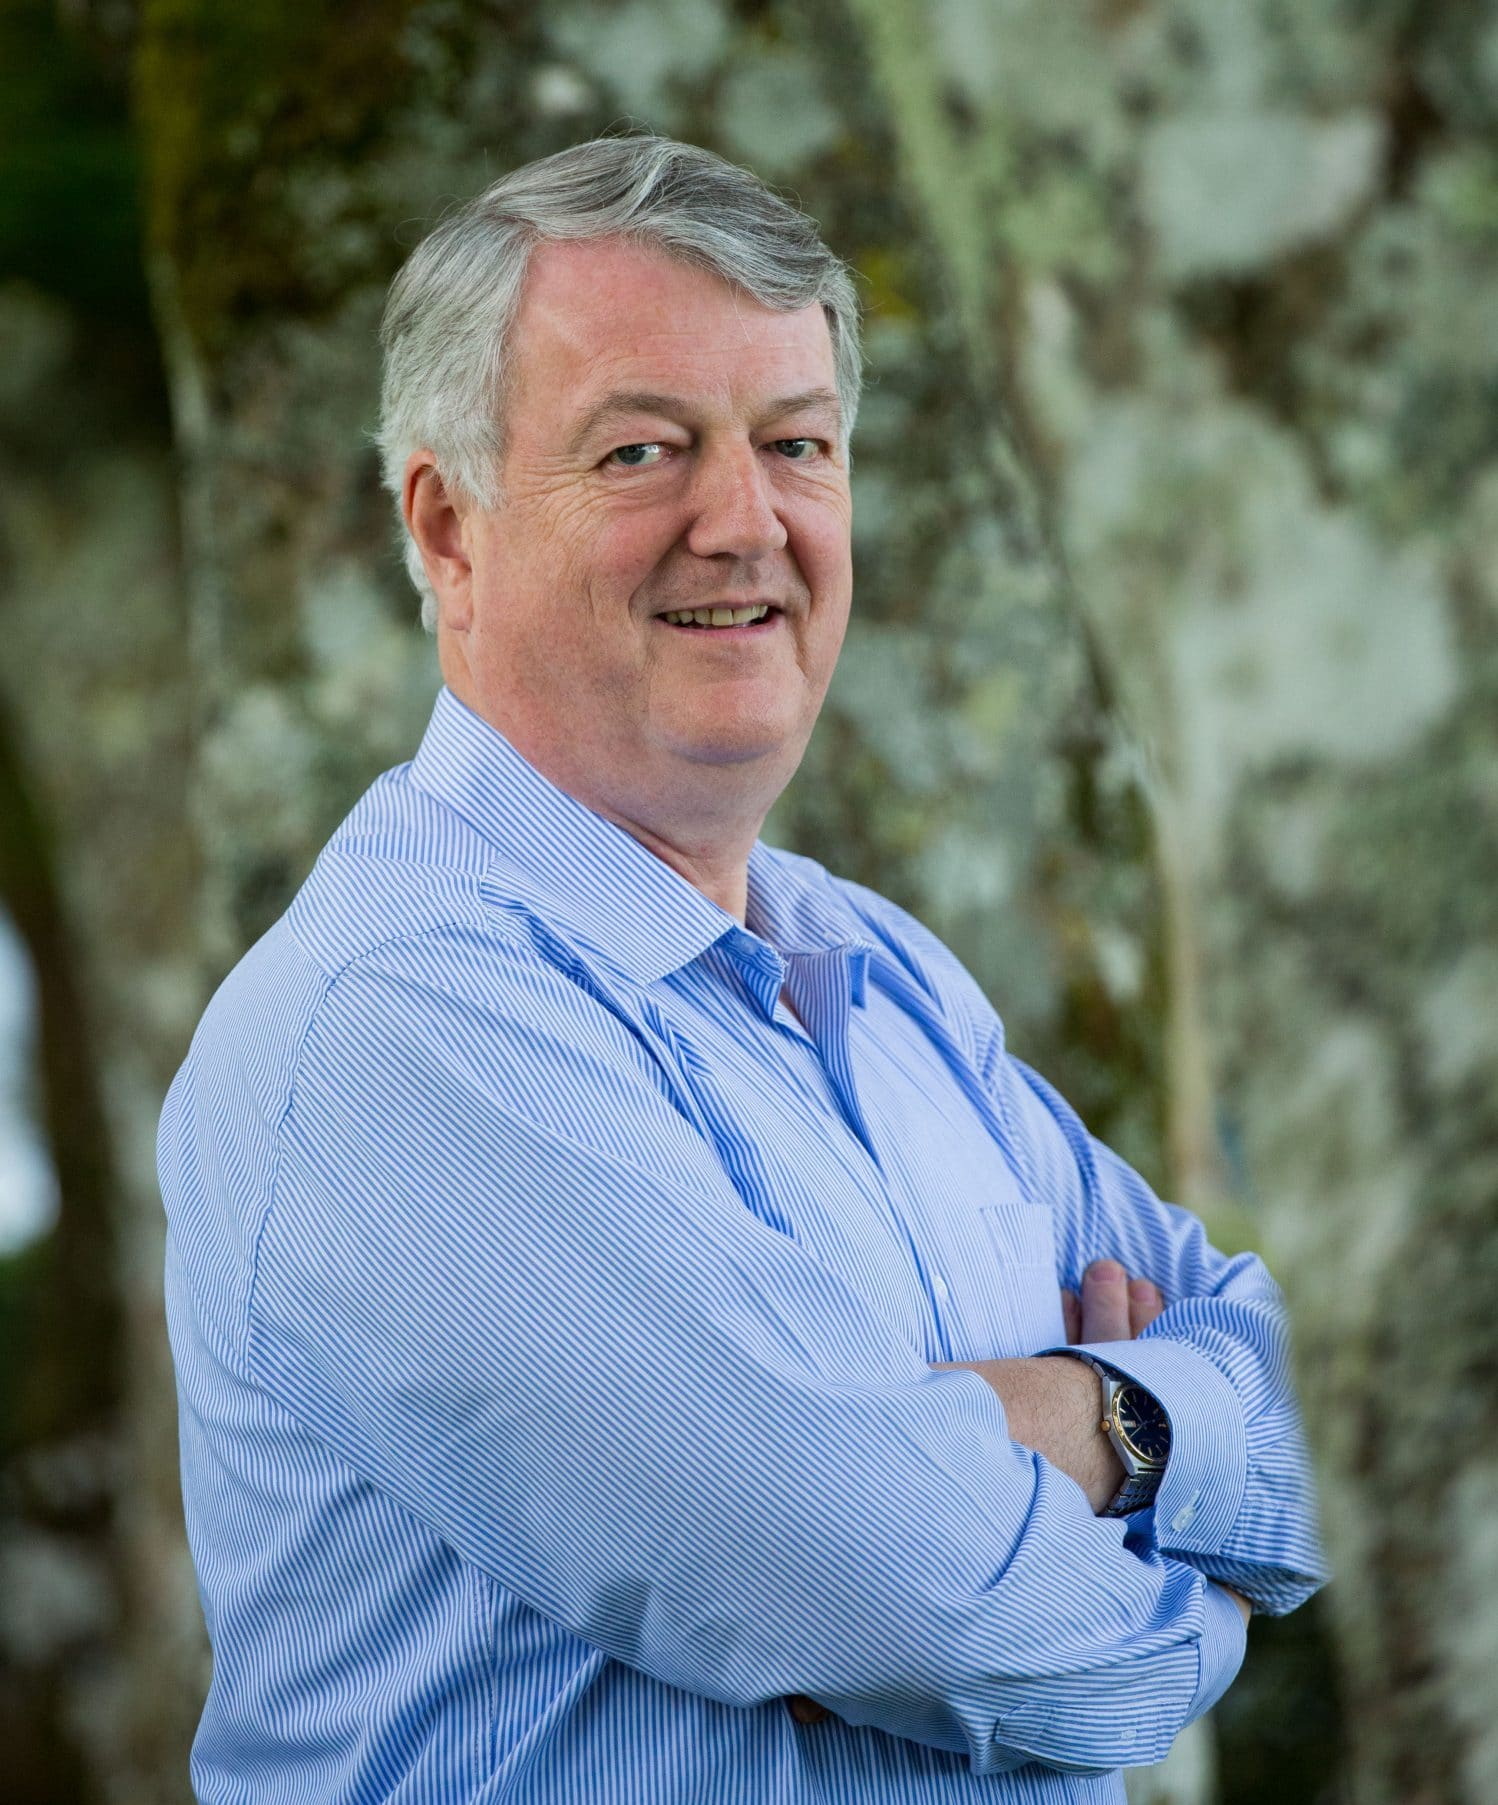 Brendan O'Malley